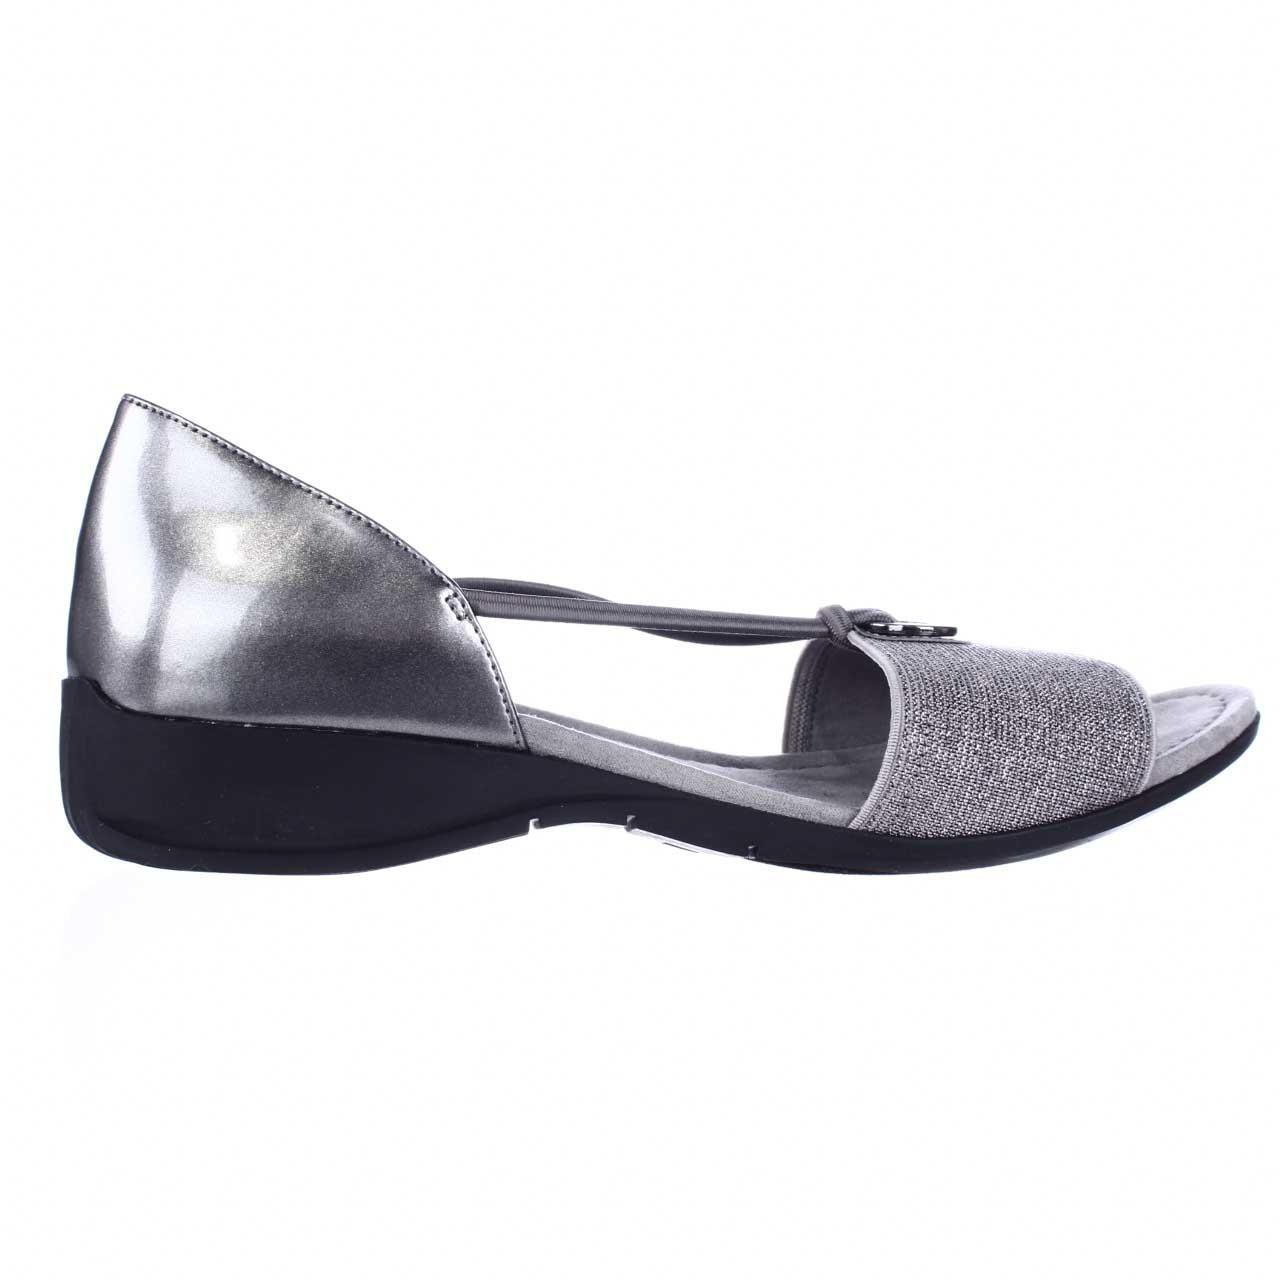 3f773a4ac53e5 ... Anne Klein Iflex Wedge Shoes: Anne Klein Sport Kameko Wedge Sandals In  Blue